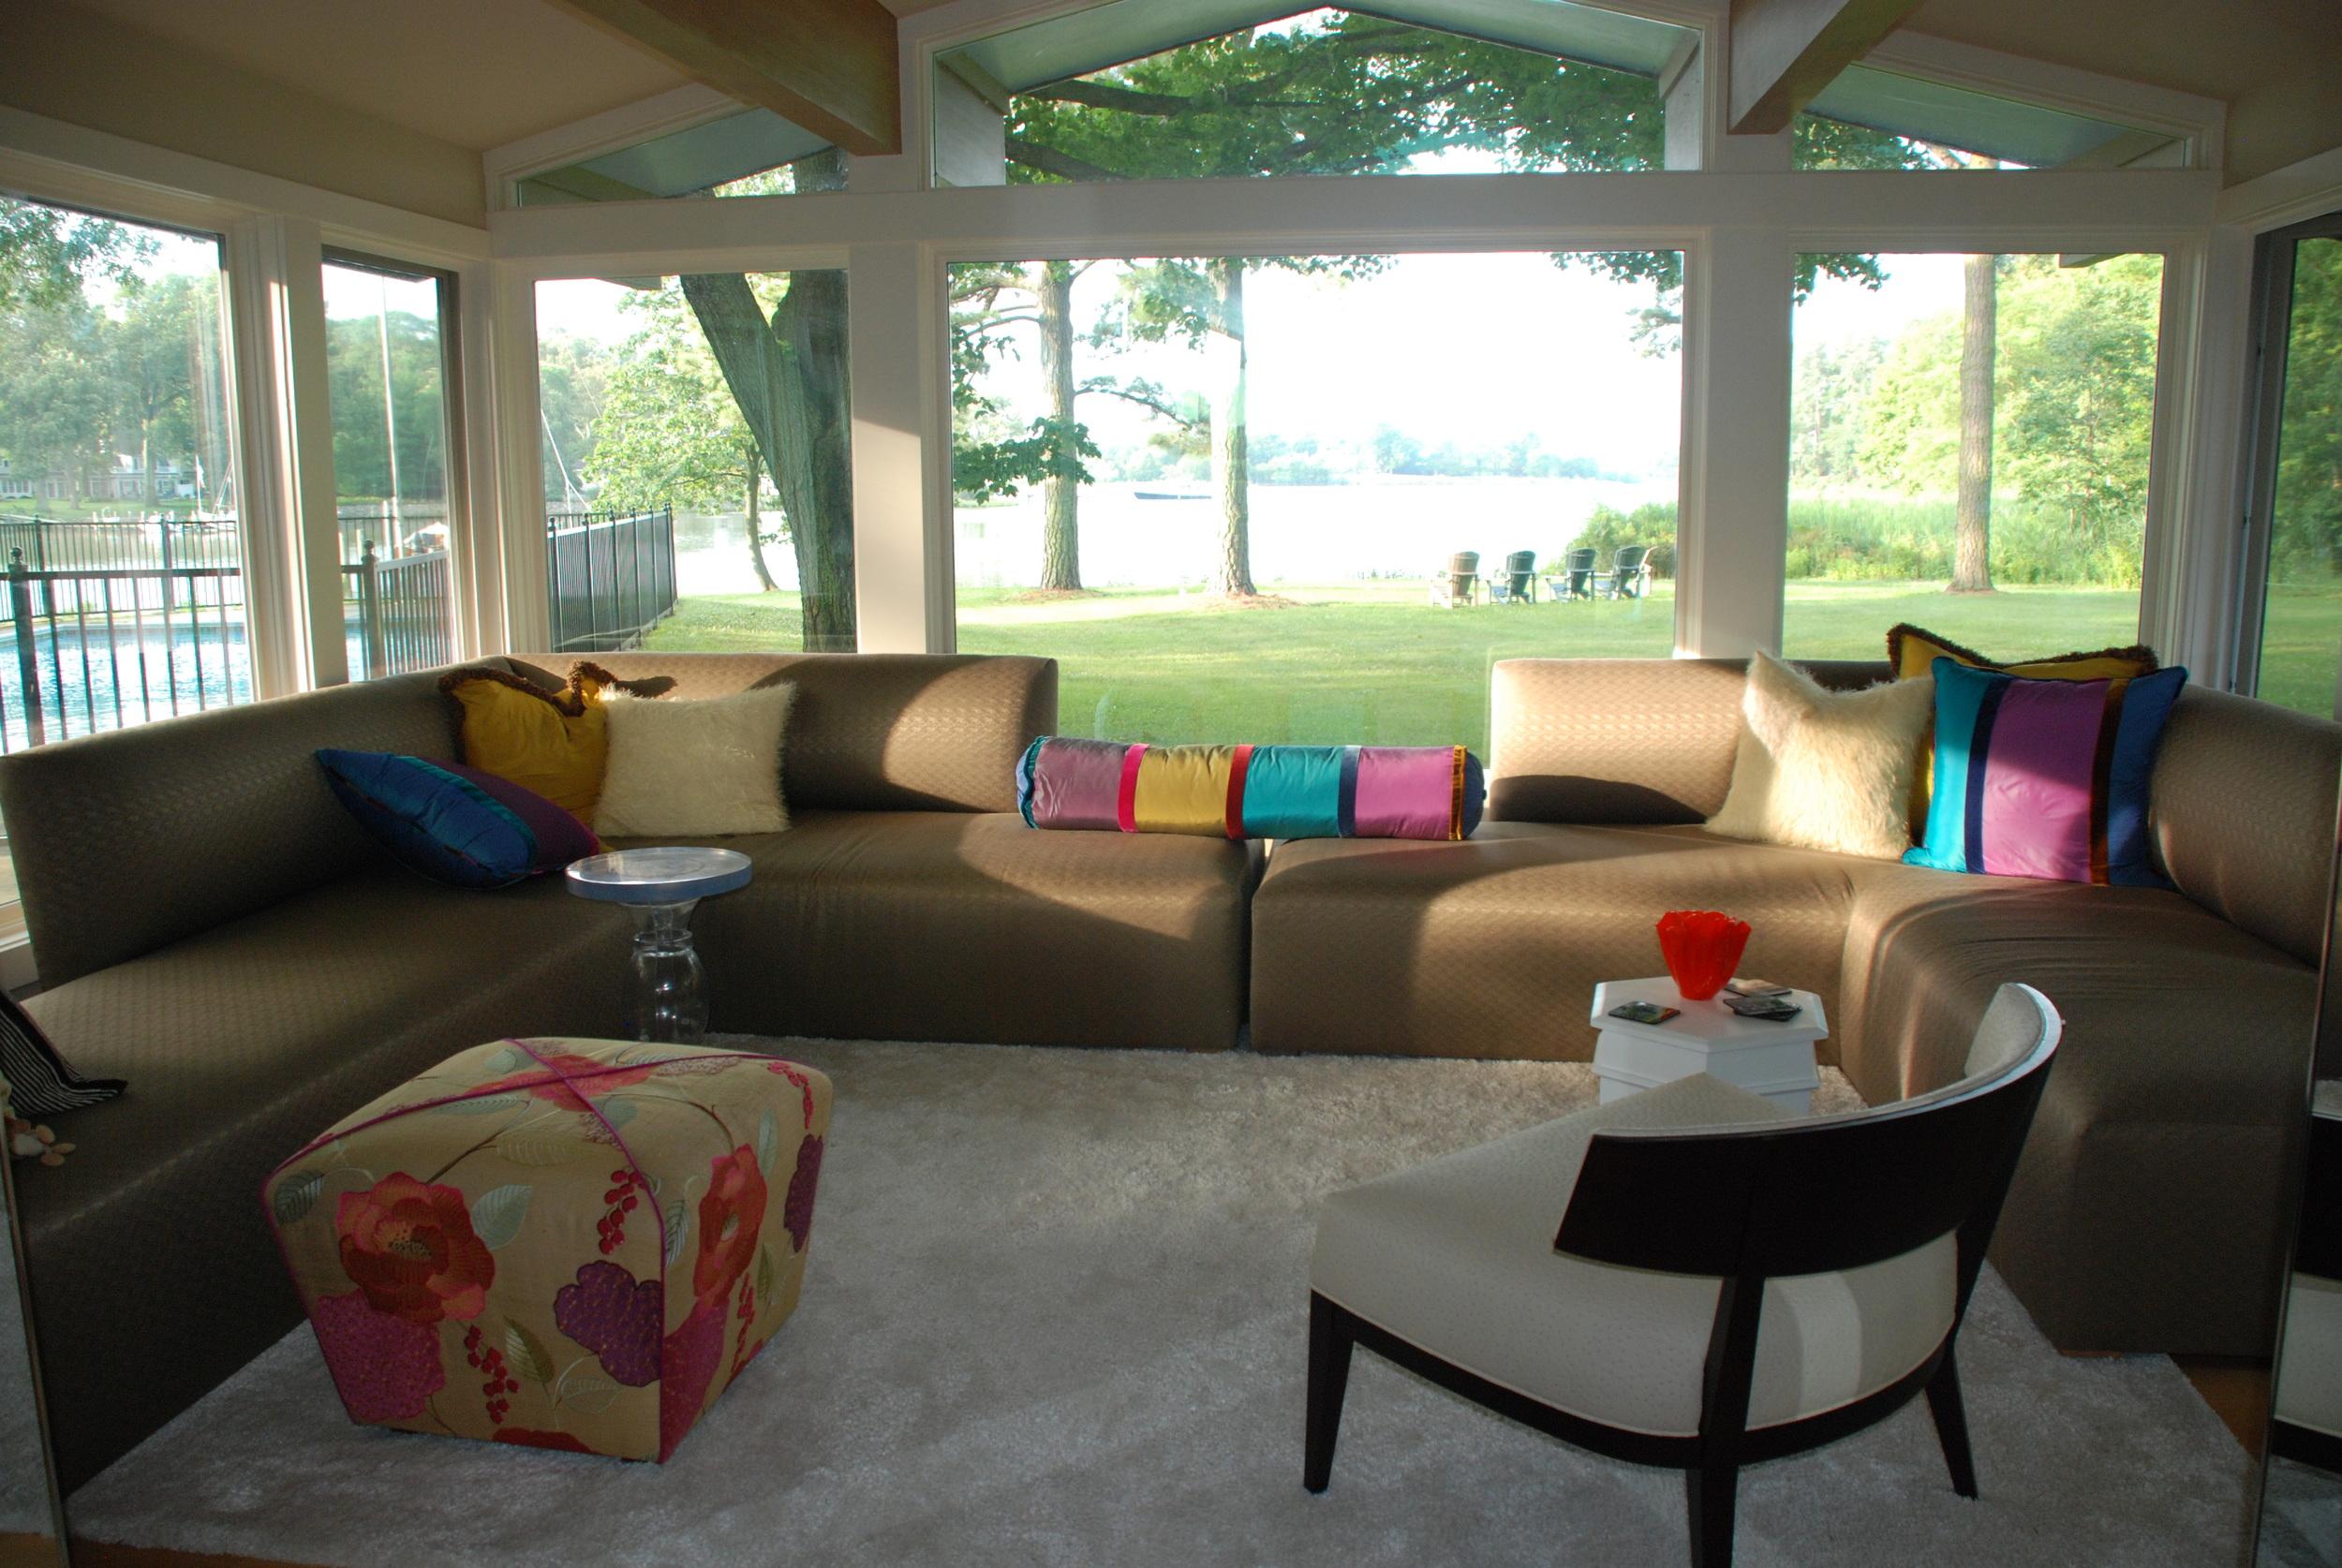 Ryan Living Room 5.JPG